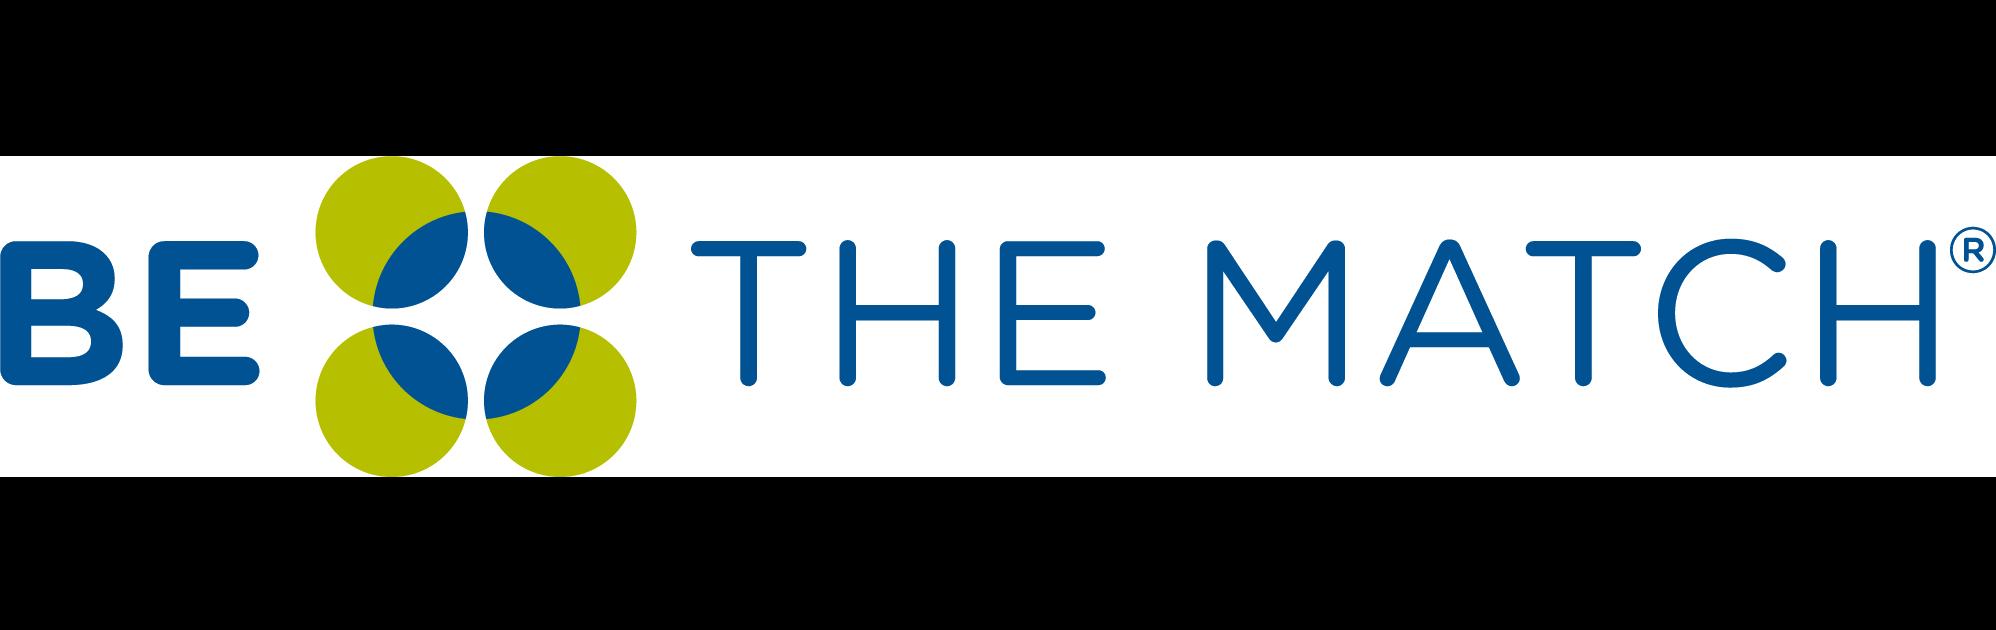 Sap Partners | Advocacy | <b>Be The Match&reg;</b>